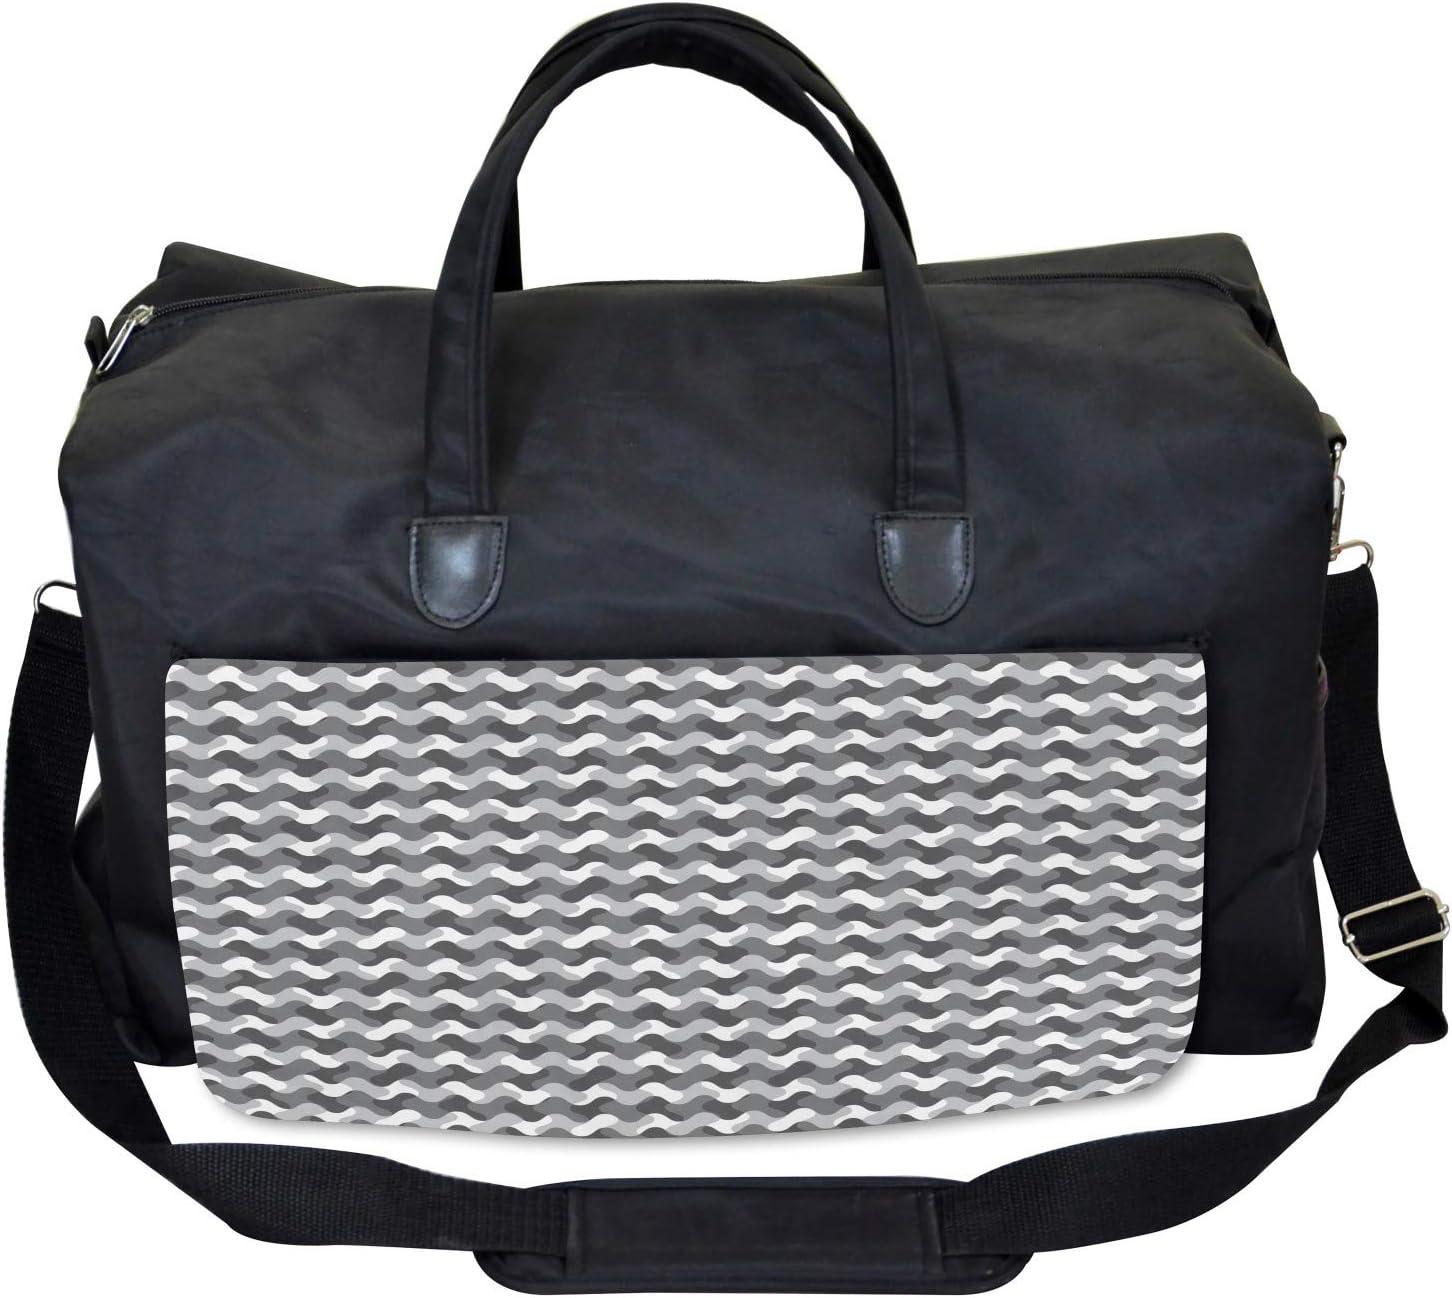 Ambesonne Gym Bag Large Weekender Carry-on Gradient Retro Lines